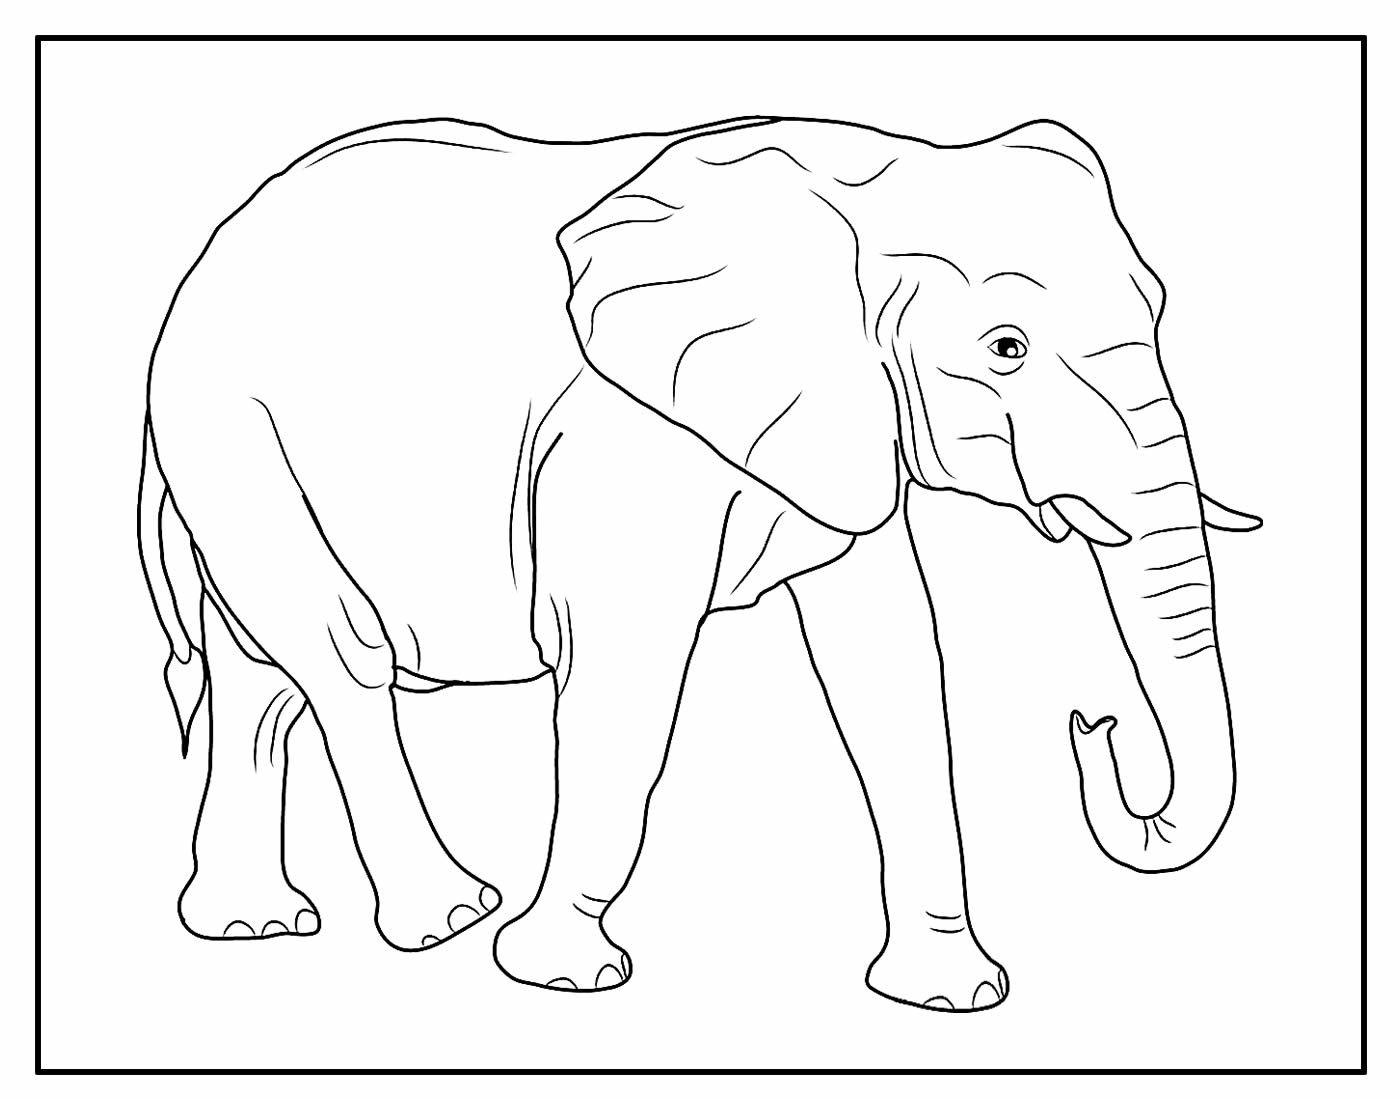 Desenho Elefante Colorir